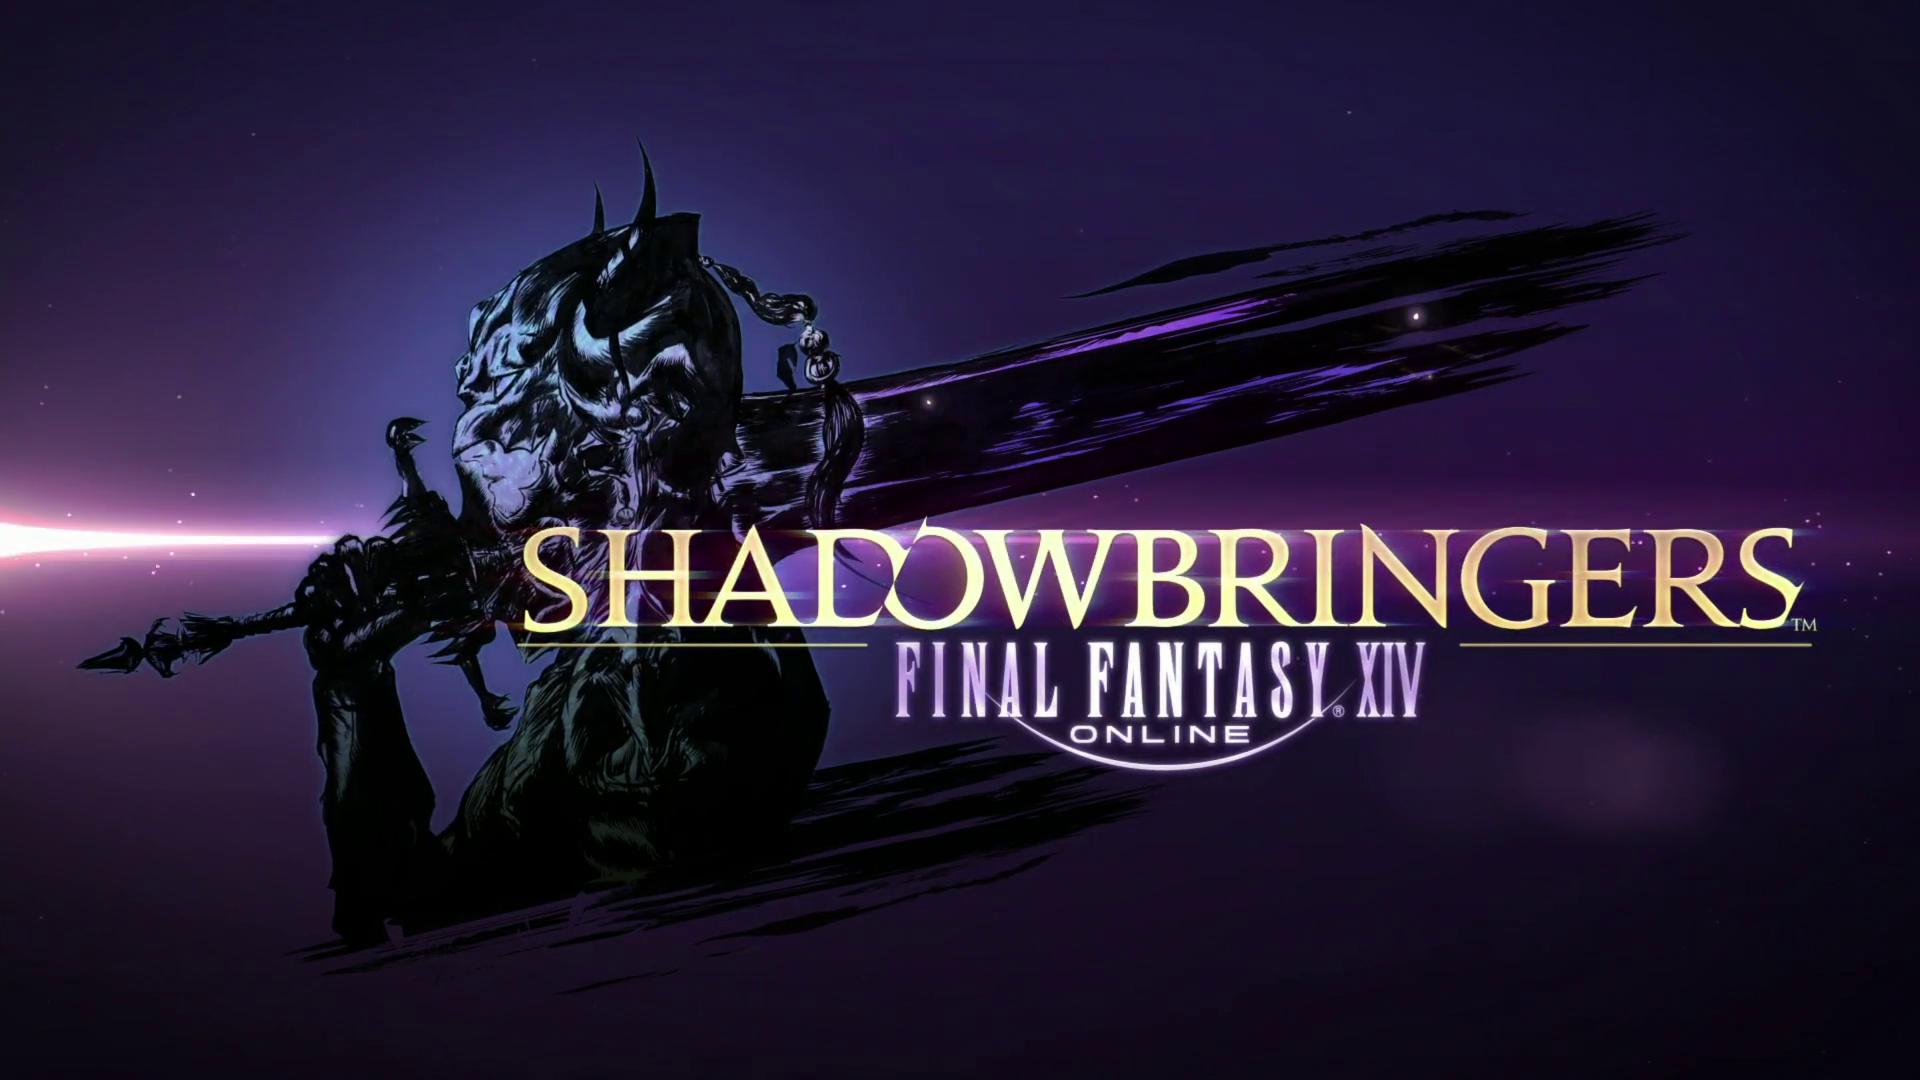 Final Fantasy 14: Shadowbringers launch trailer reveals secrets of